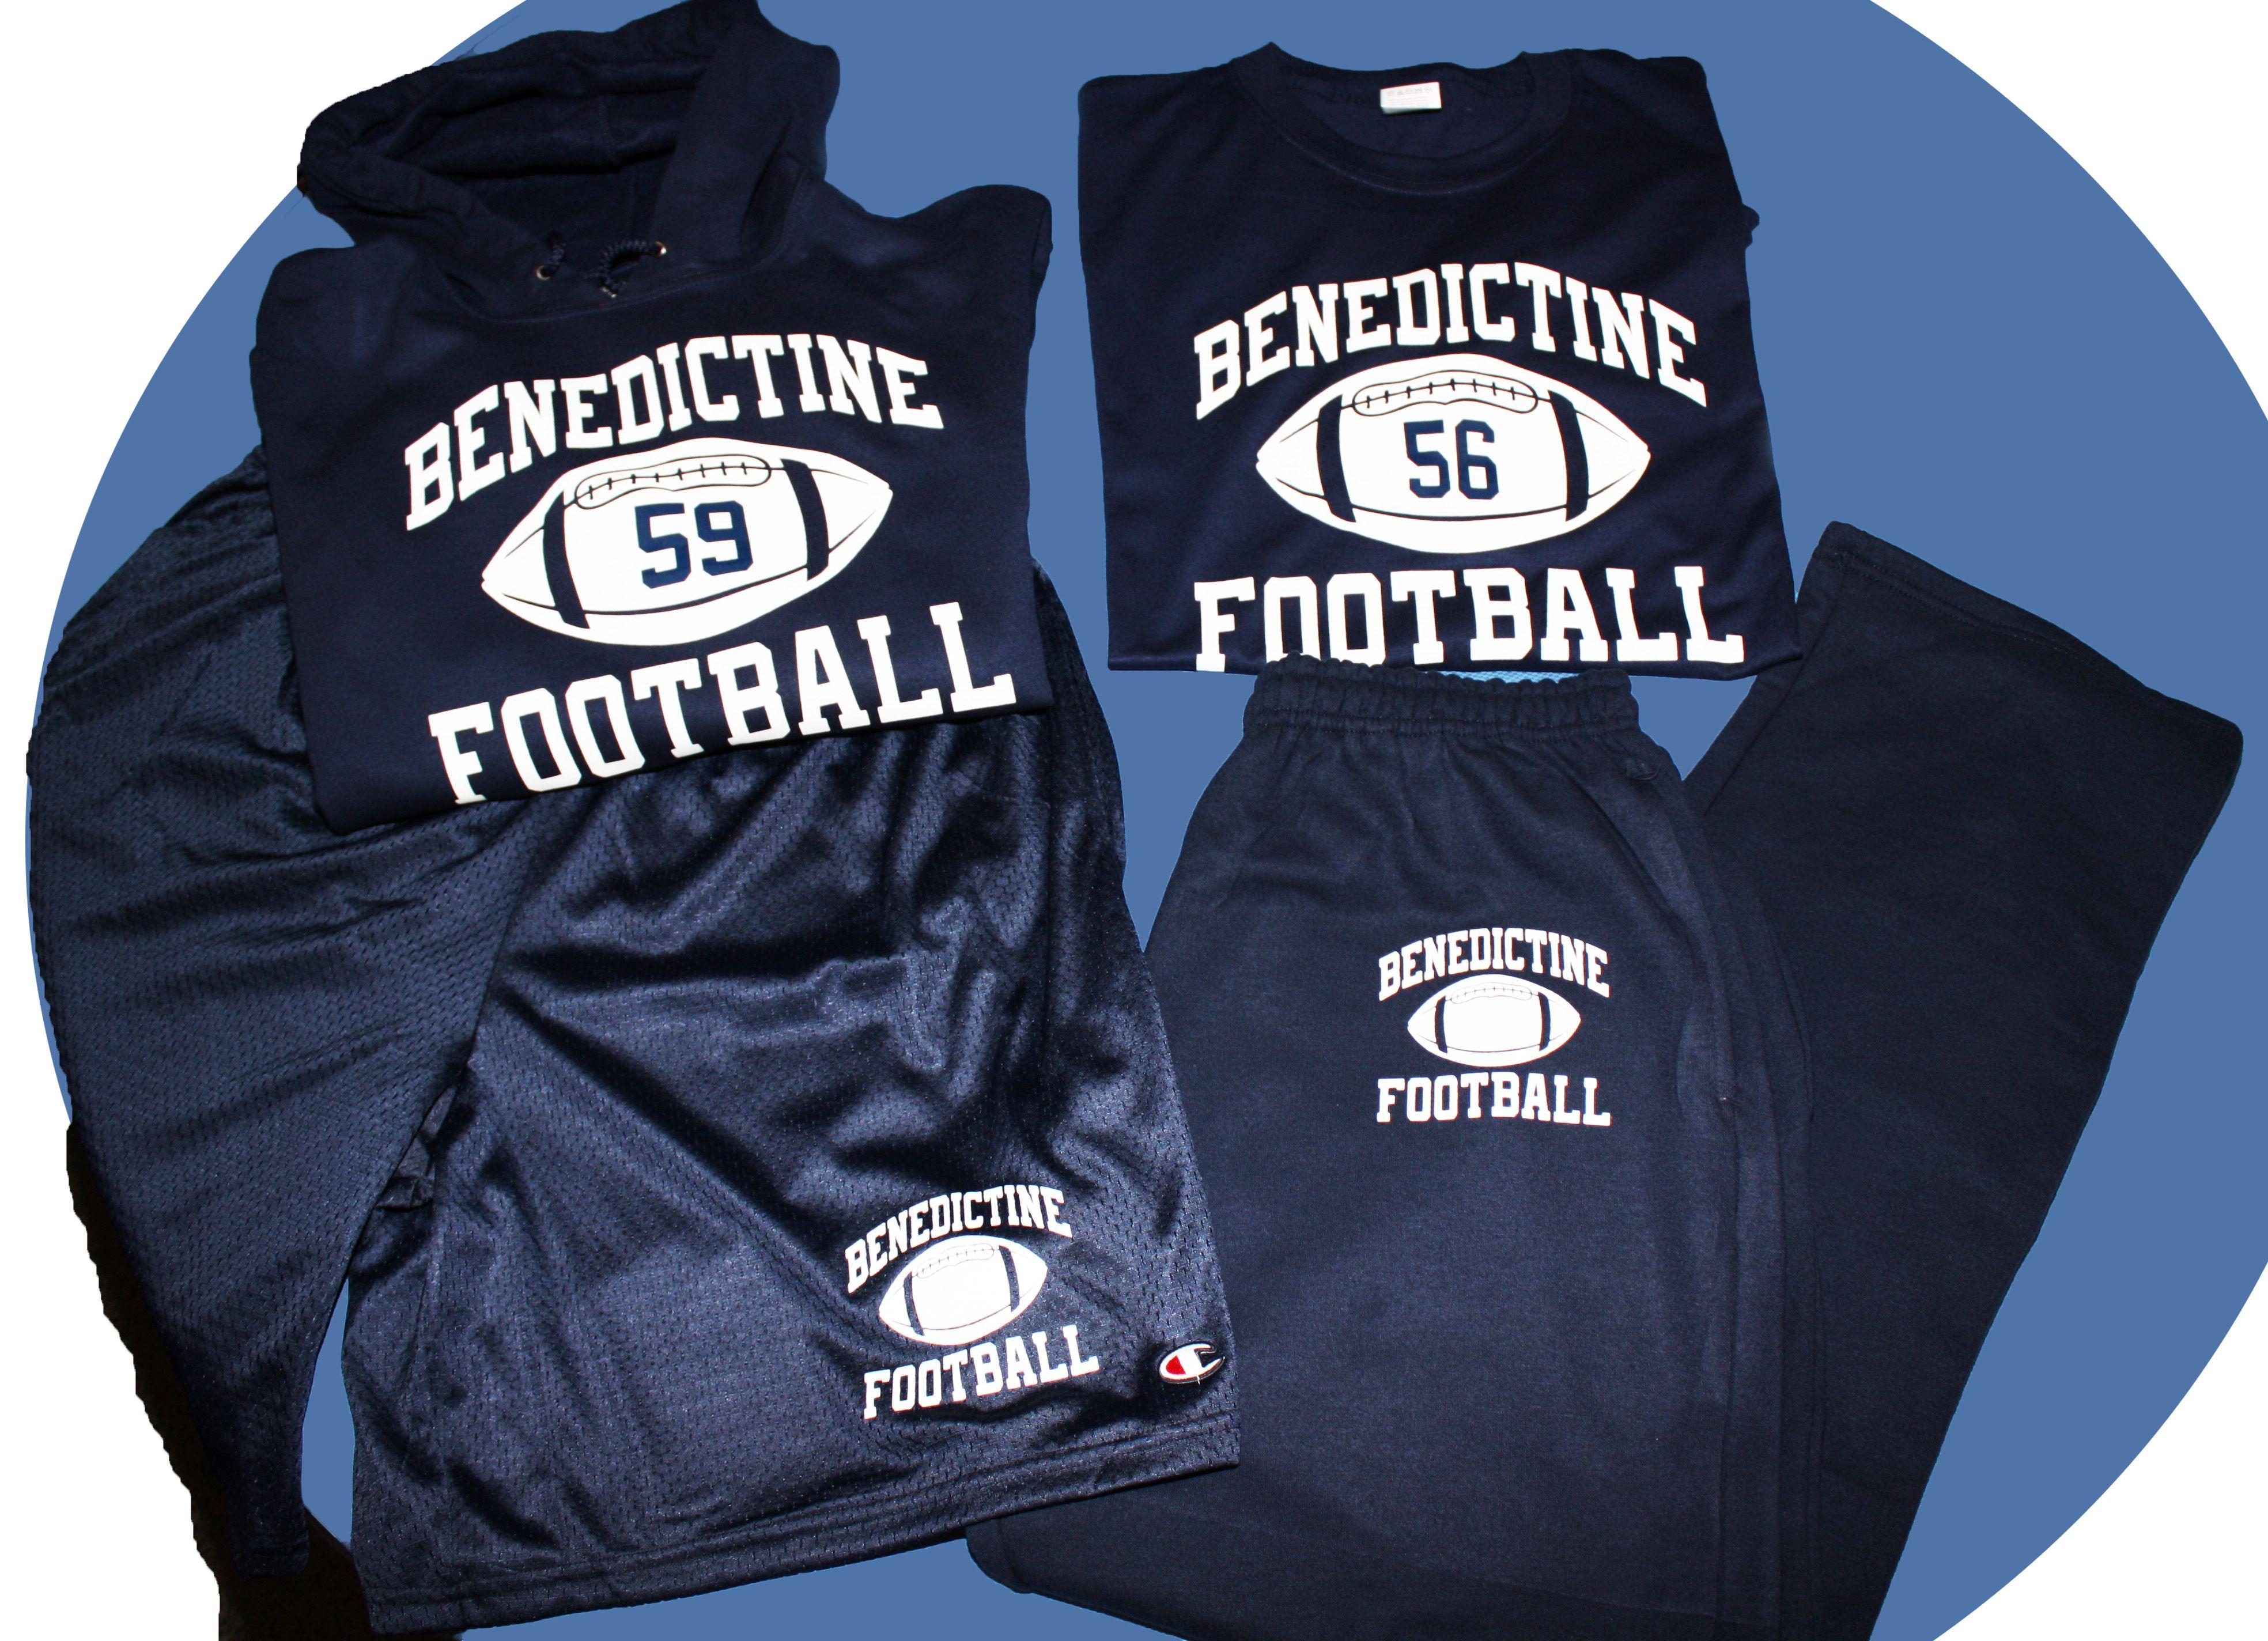 football mom t shirt design ideas - Football T Shirt Design Ideas